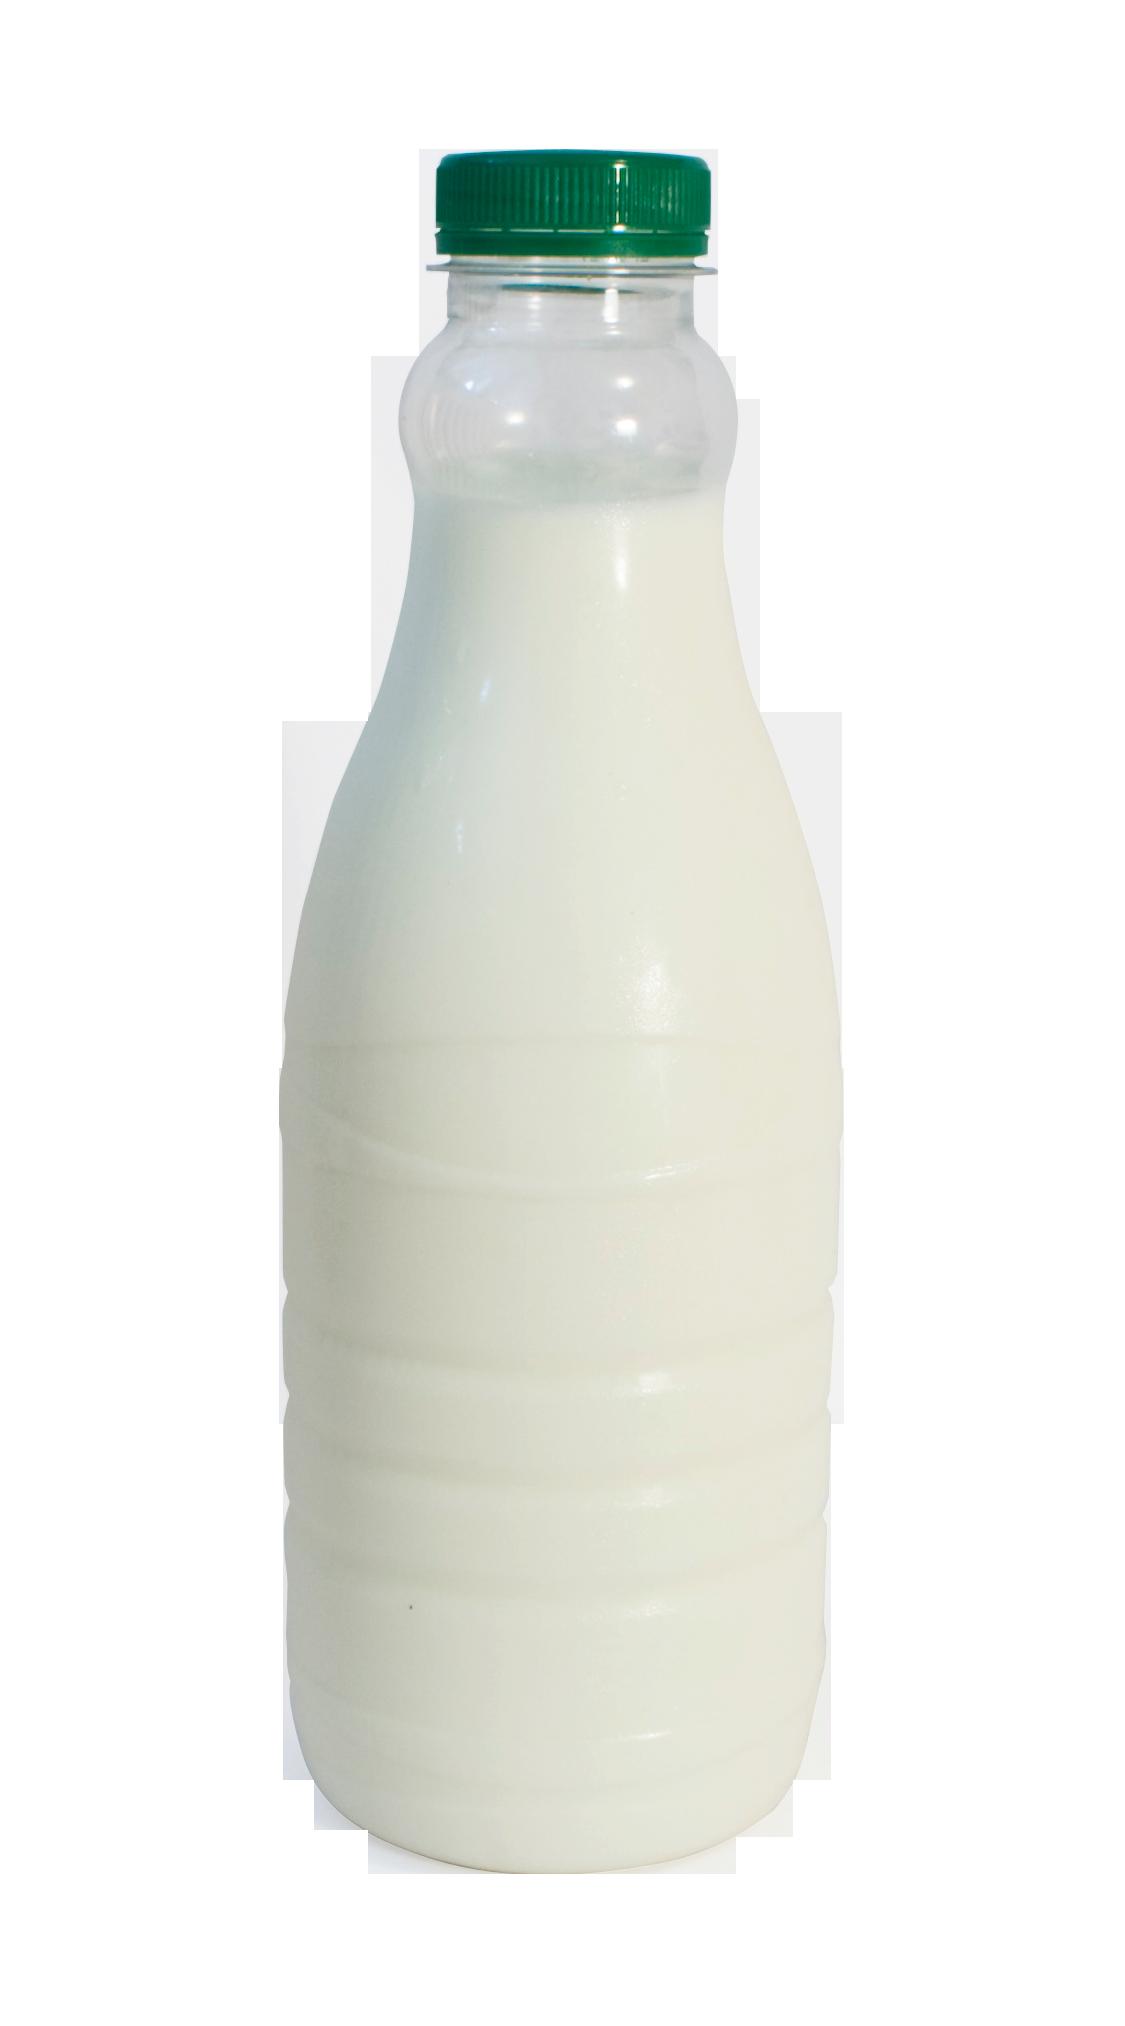 Png Milk Bottle - Png Milk Bottle Hdpng.com 1125, Transparent background PNG HD thumbnail